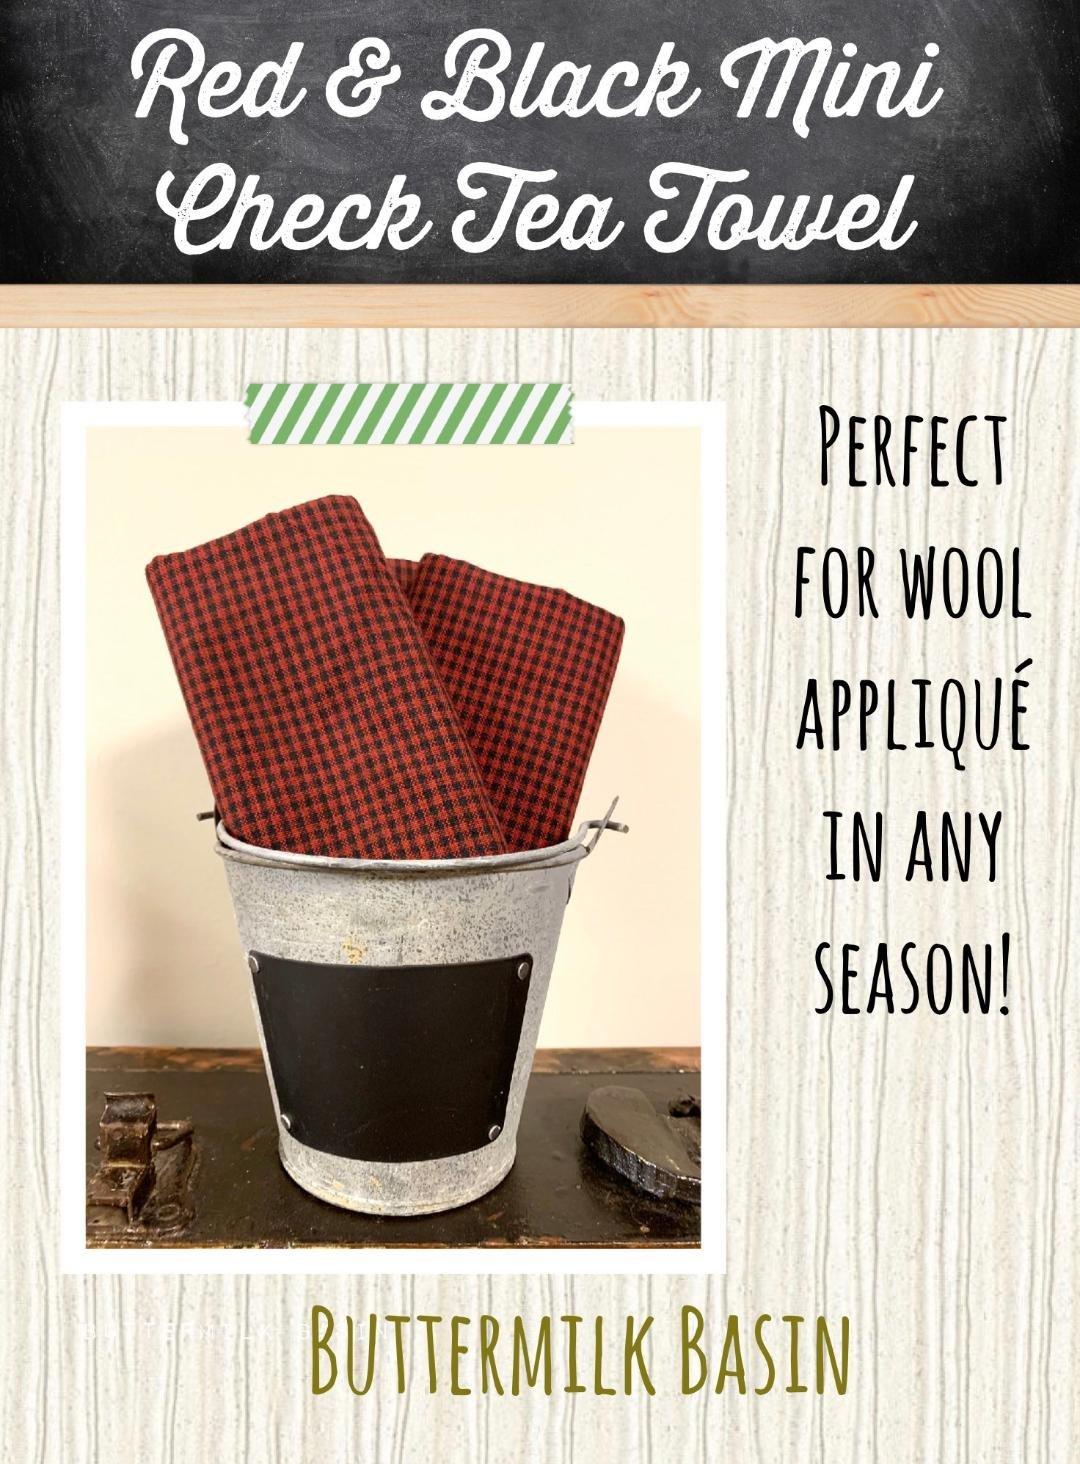 Red & Black Mini Check Tea Towel